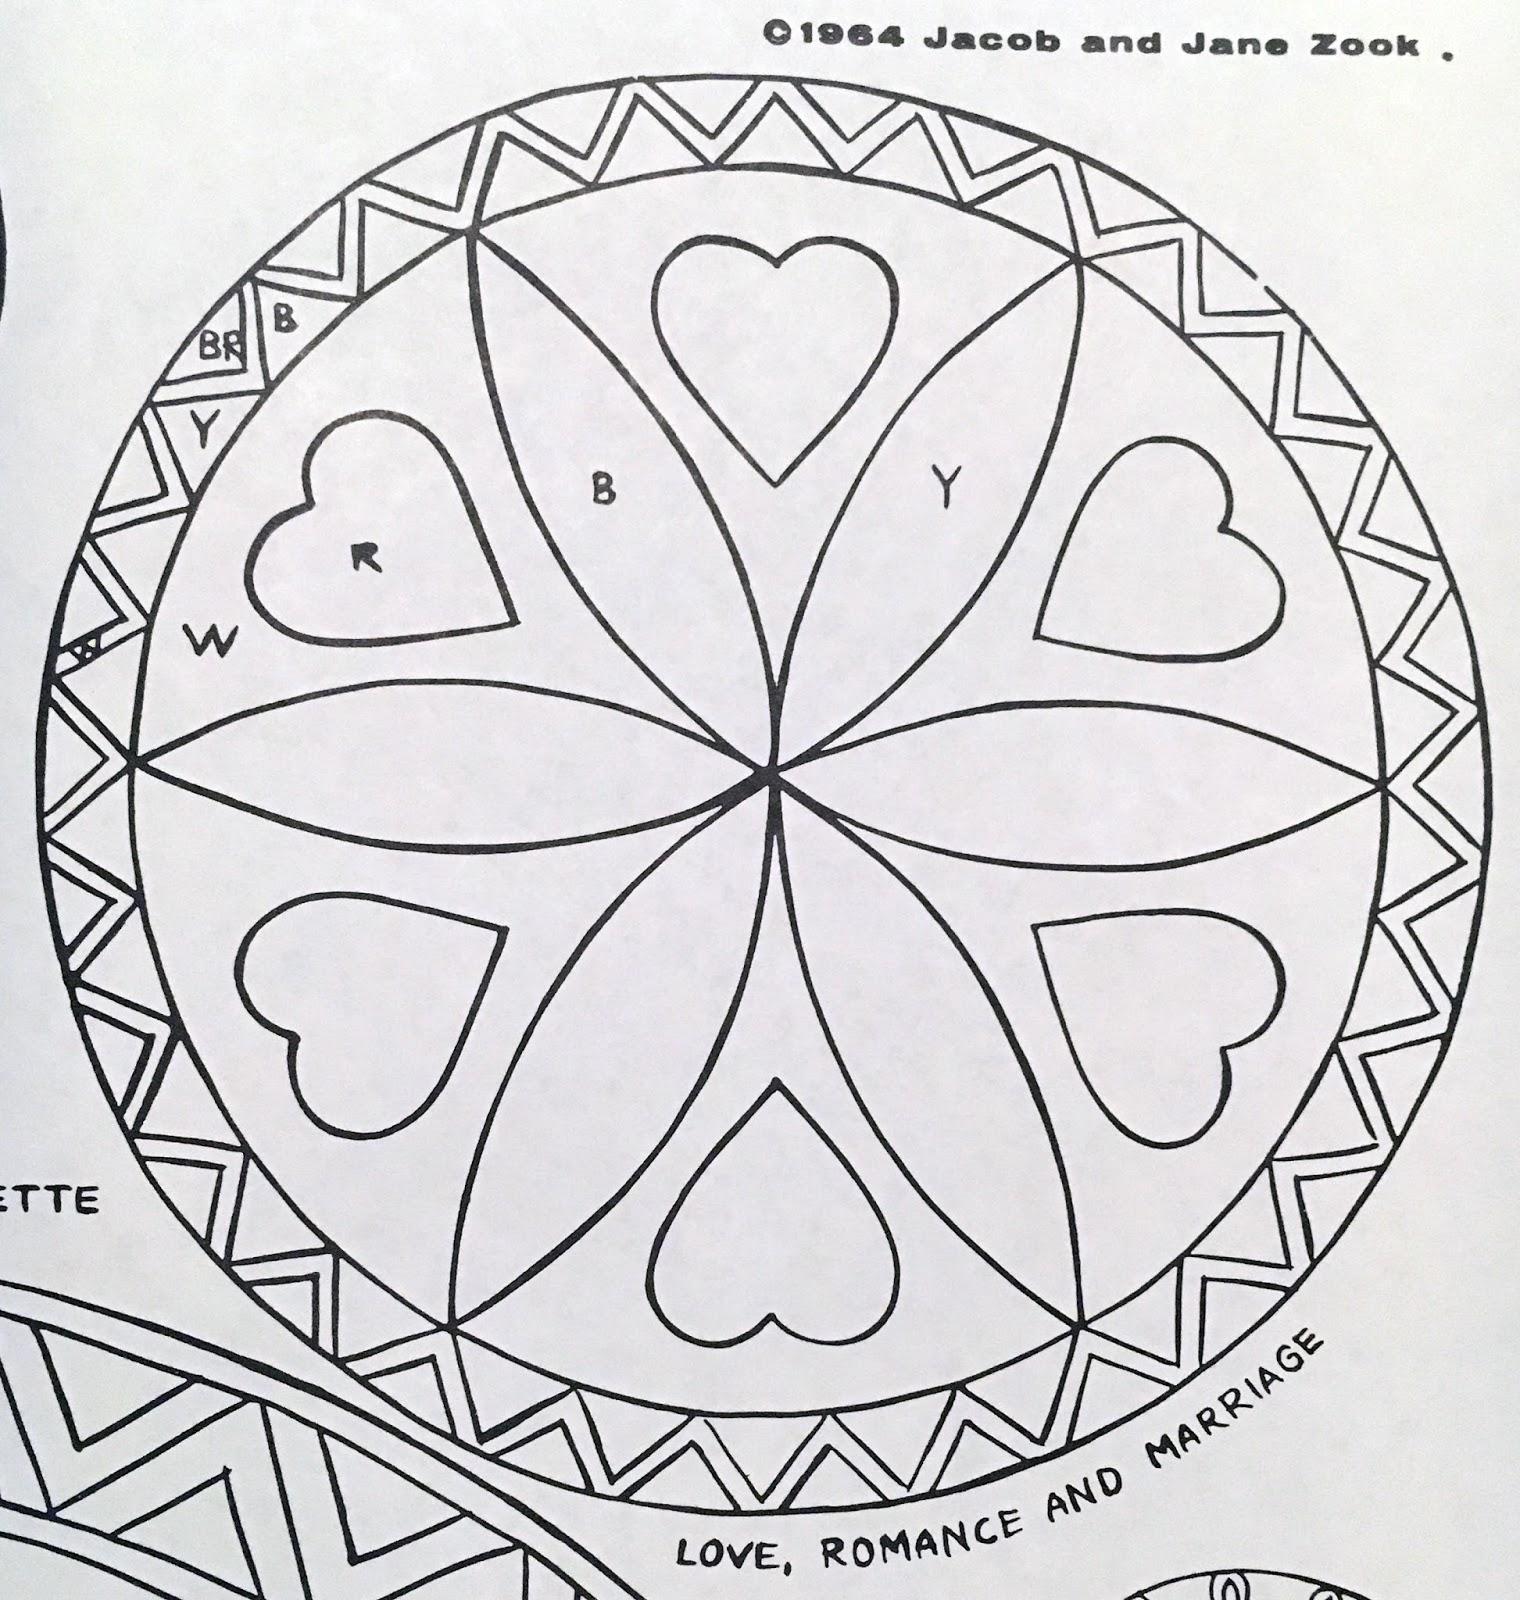 The Monkey Buddha Amish Hex Sign Rosette Patterns